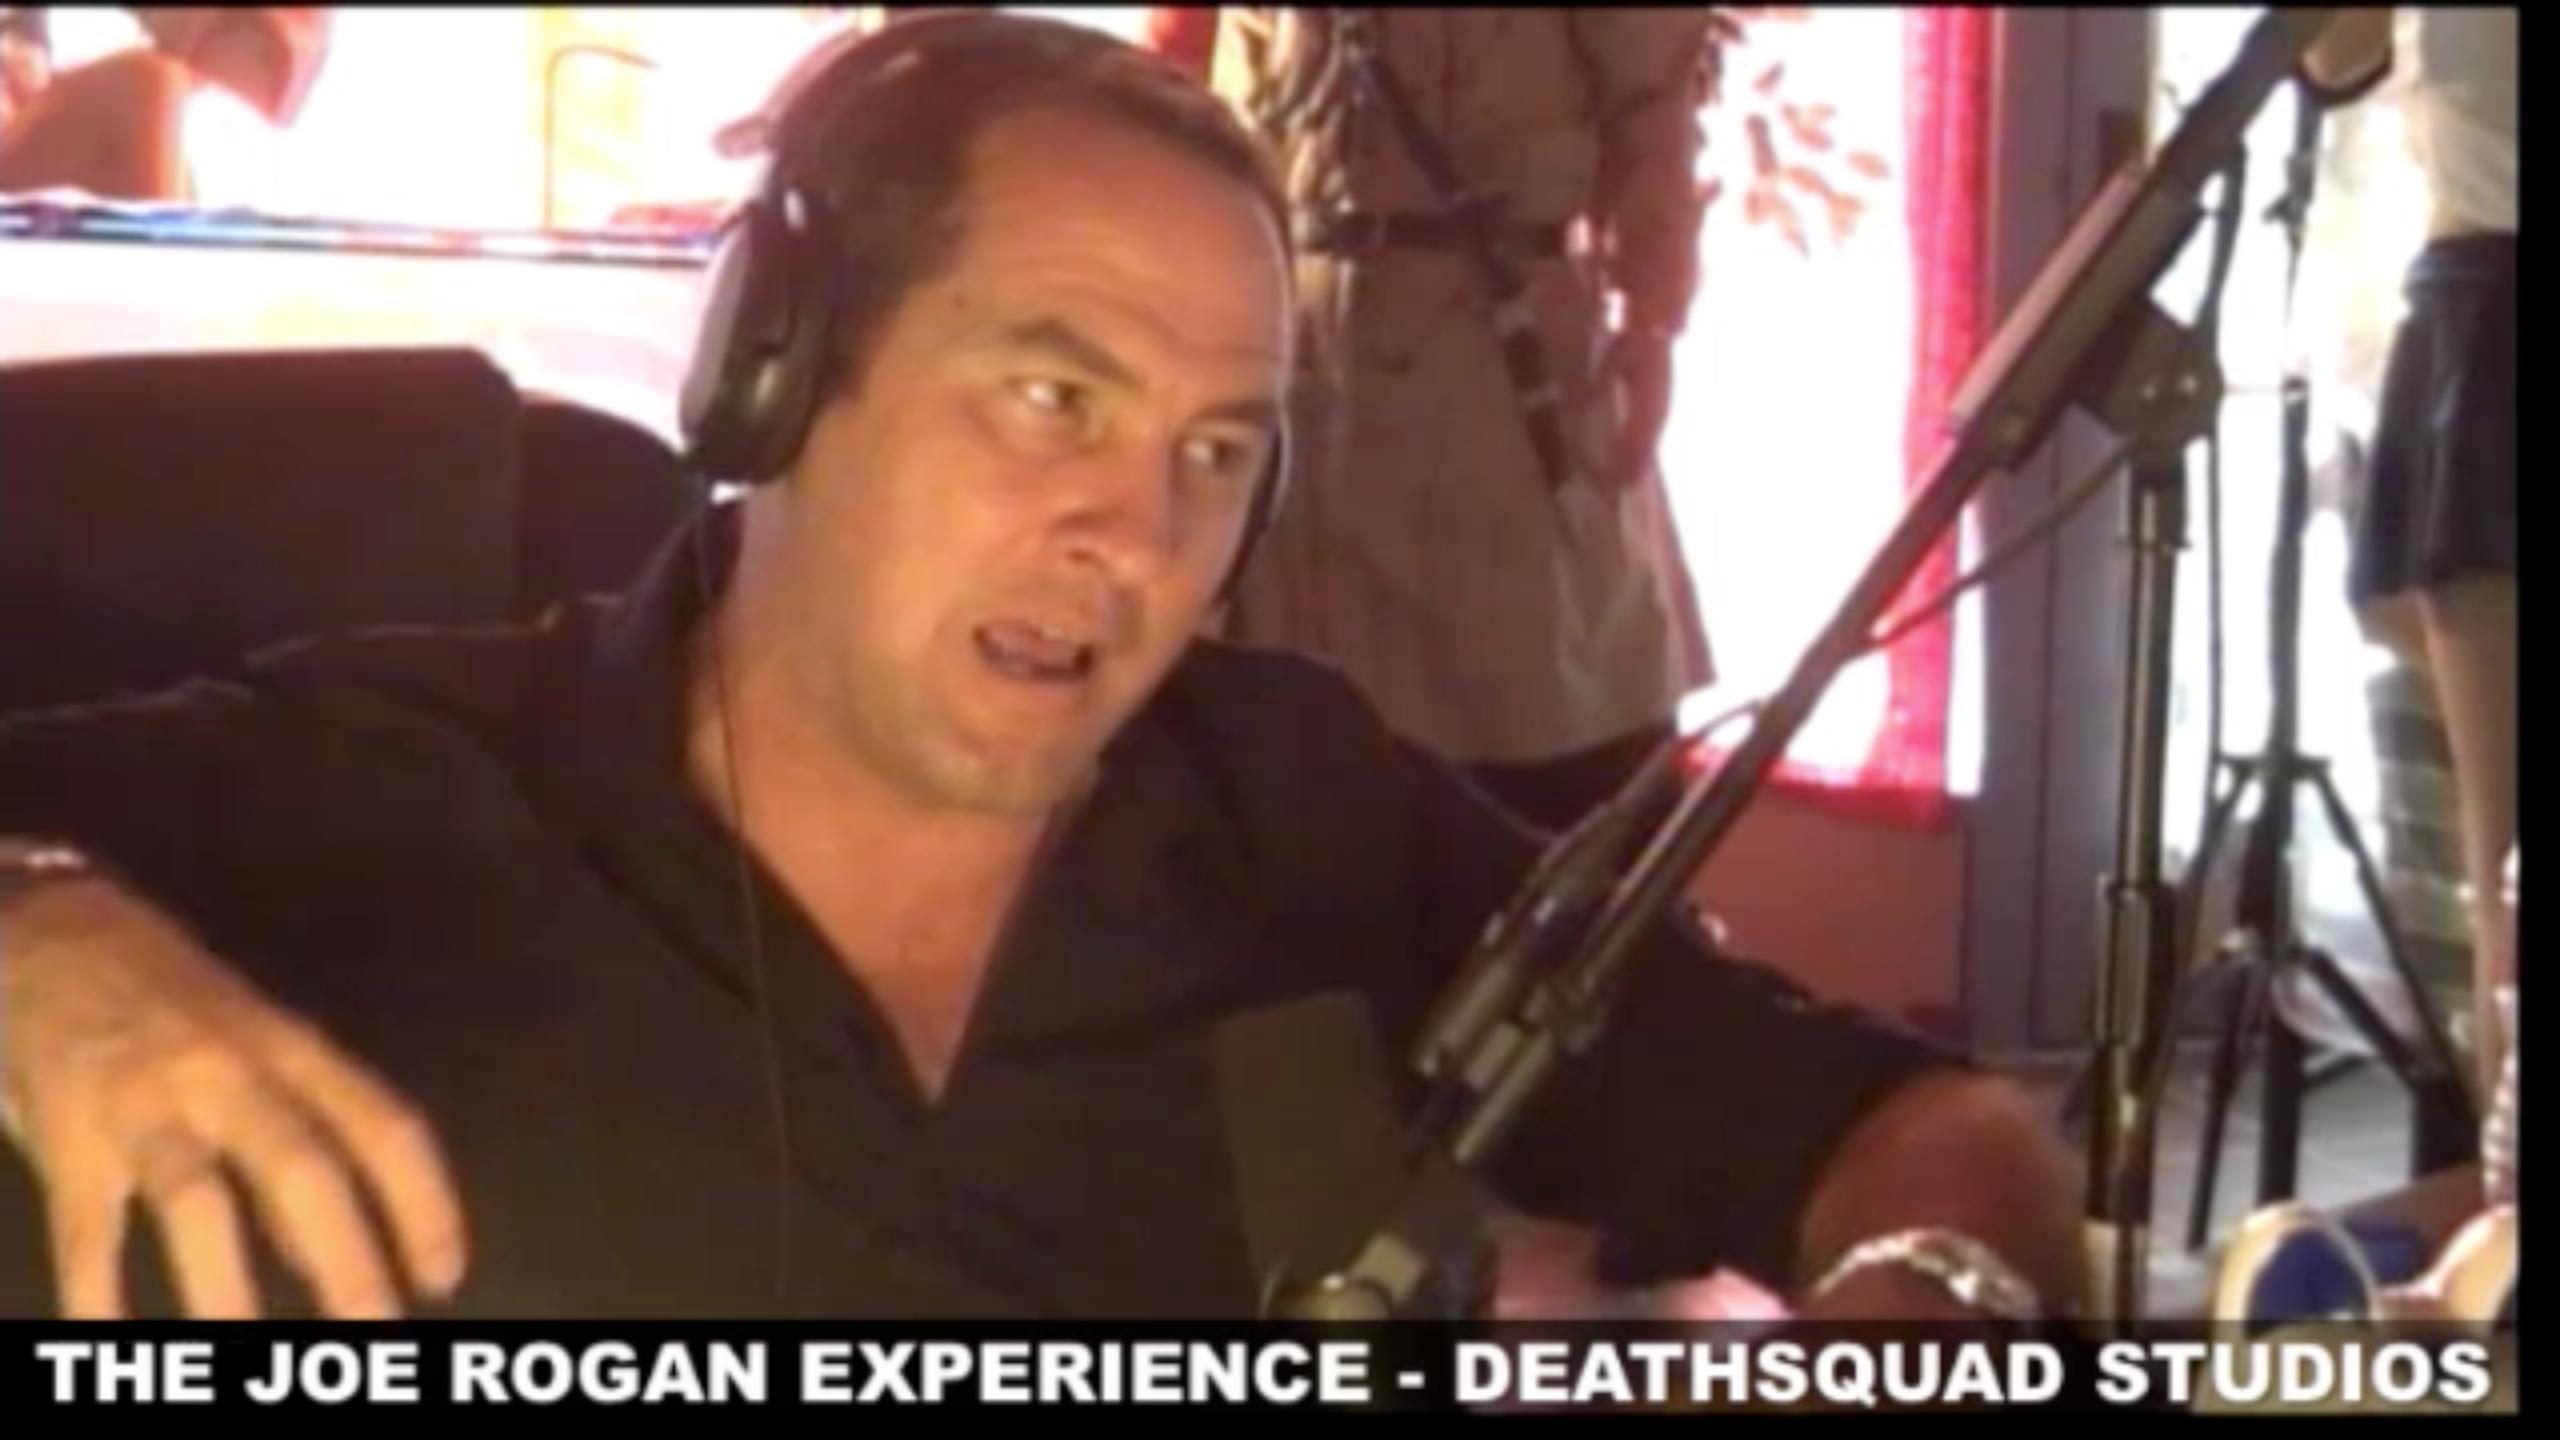 The Joe Rogan Experience #248 - Tom Rhodes, Brian Redban